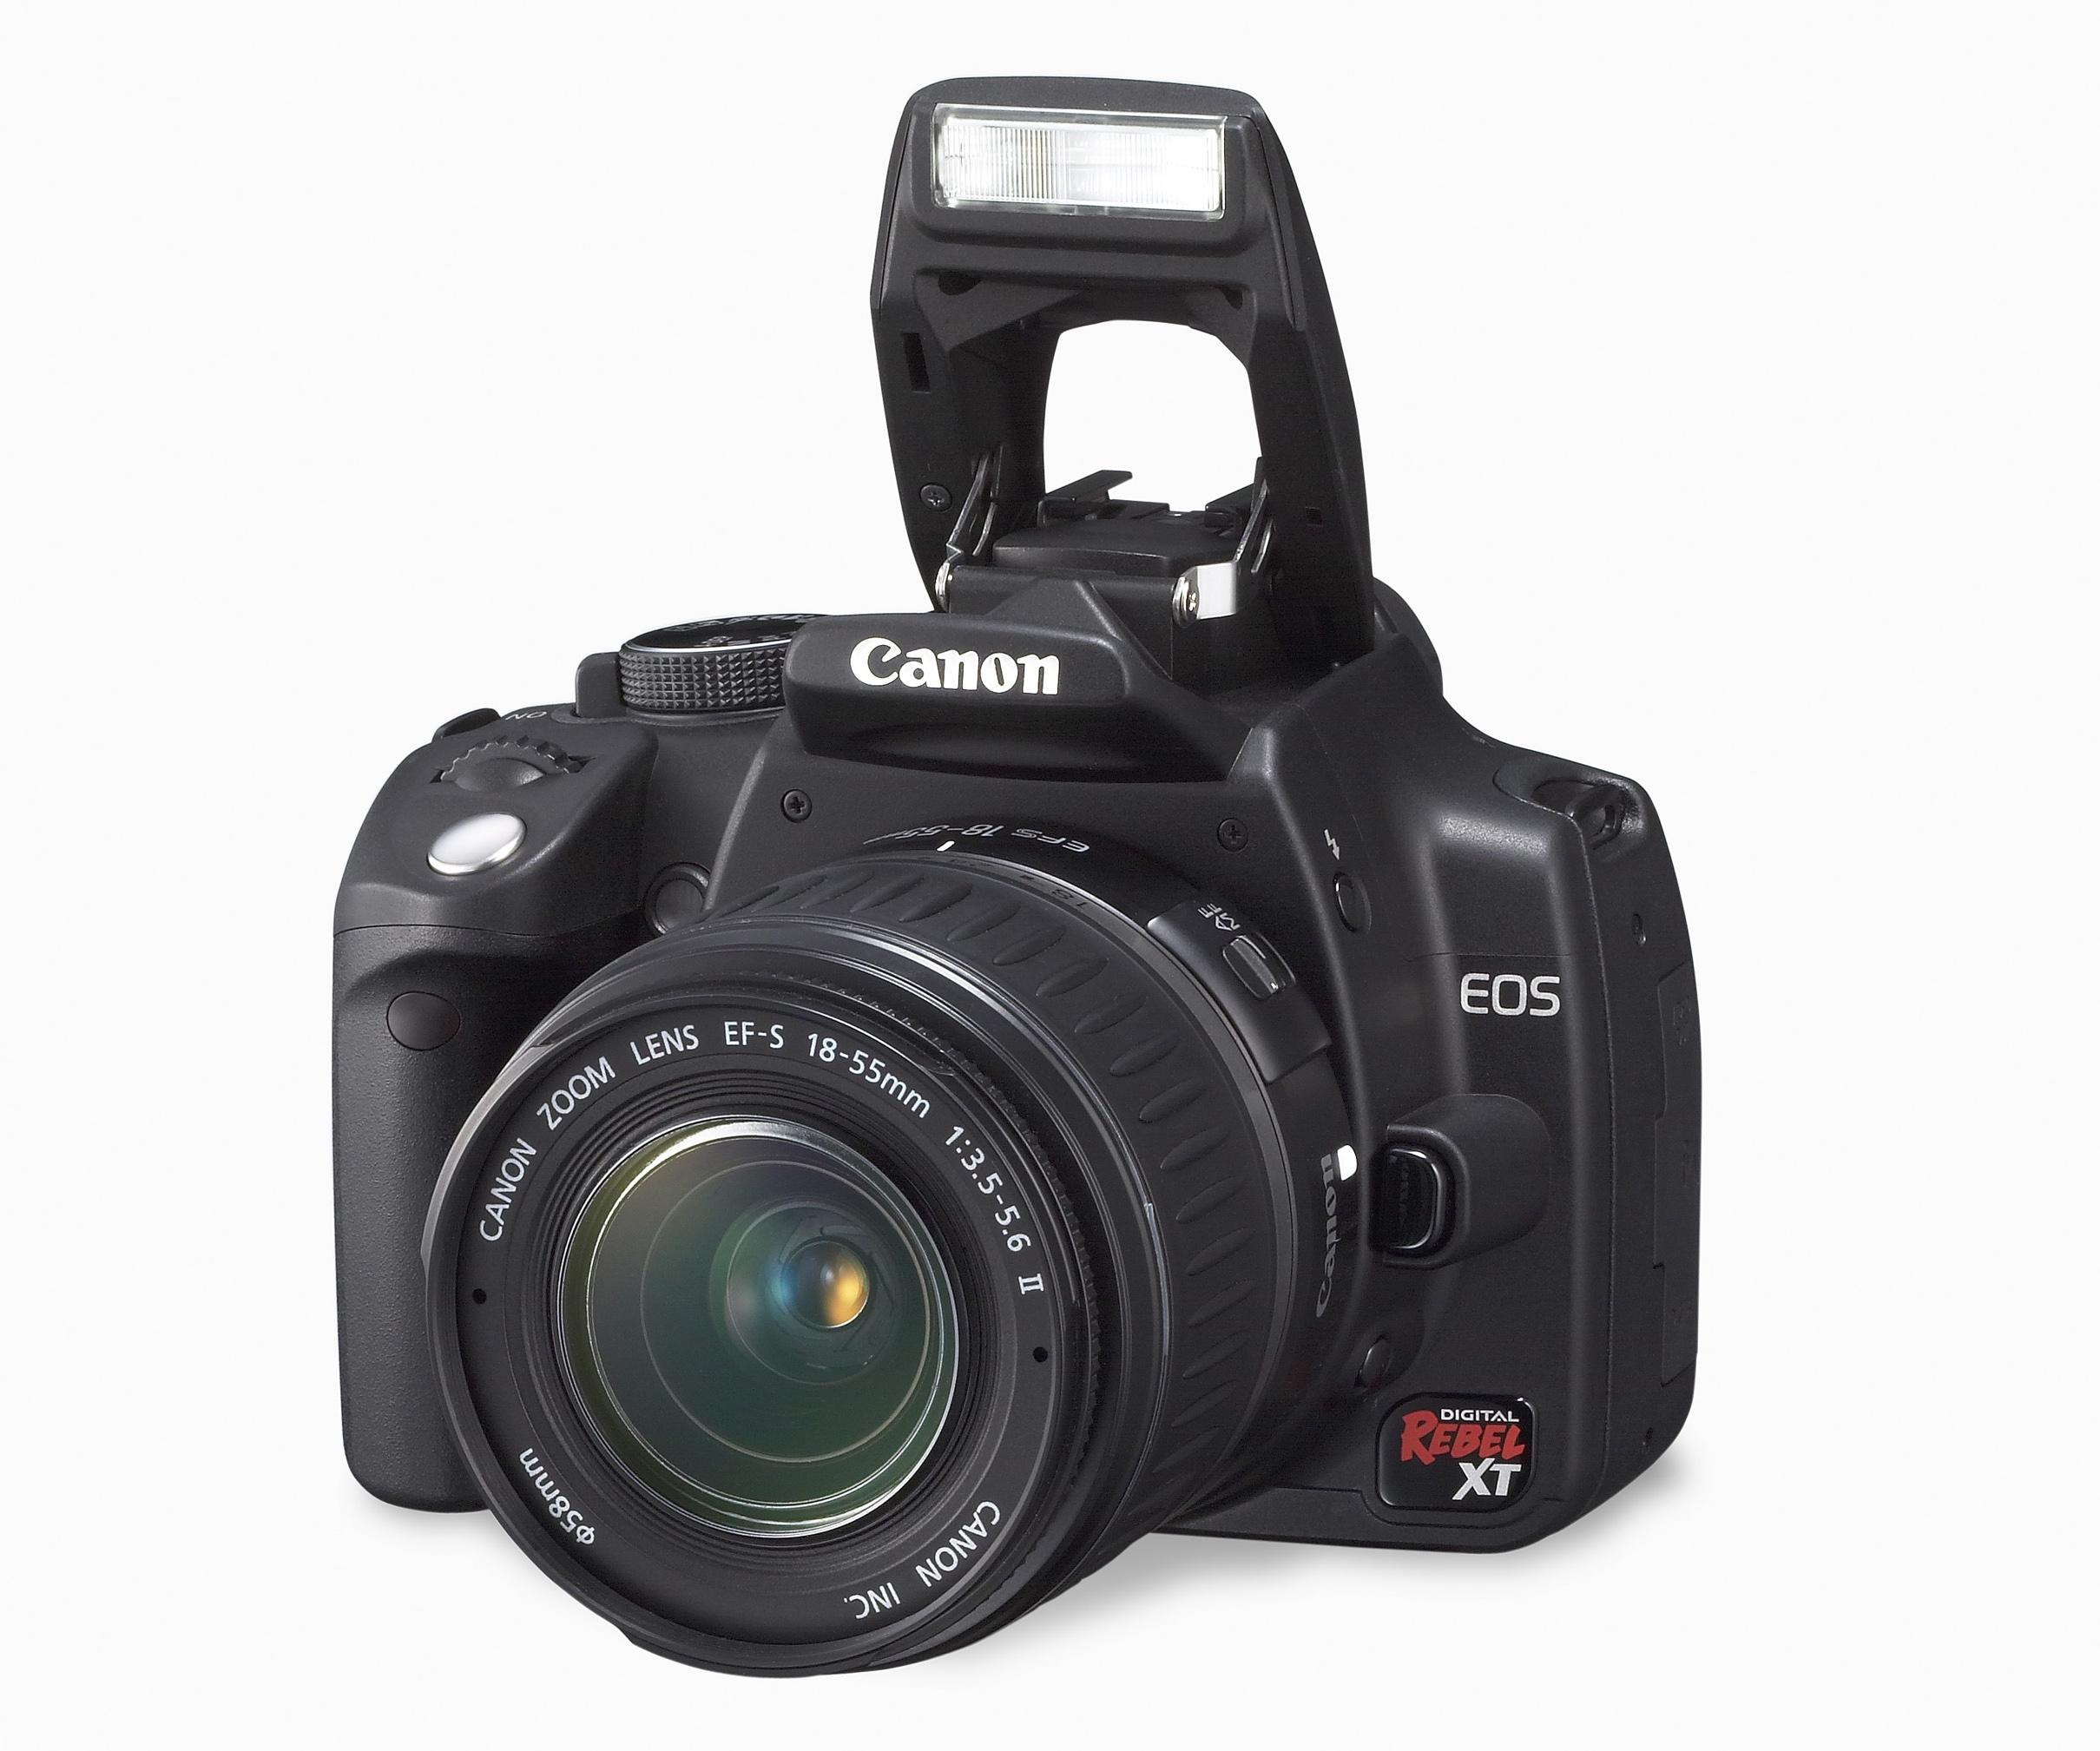 Camera Canon Eos 350d Dslr Camera 350d chdk wiki fandom powered by wikia eos front